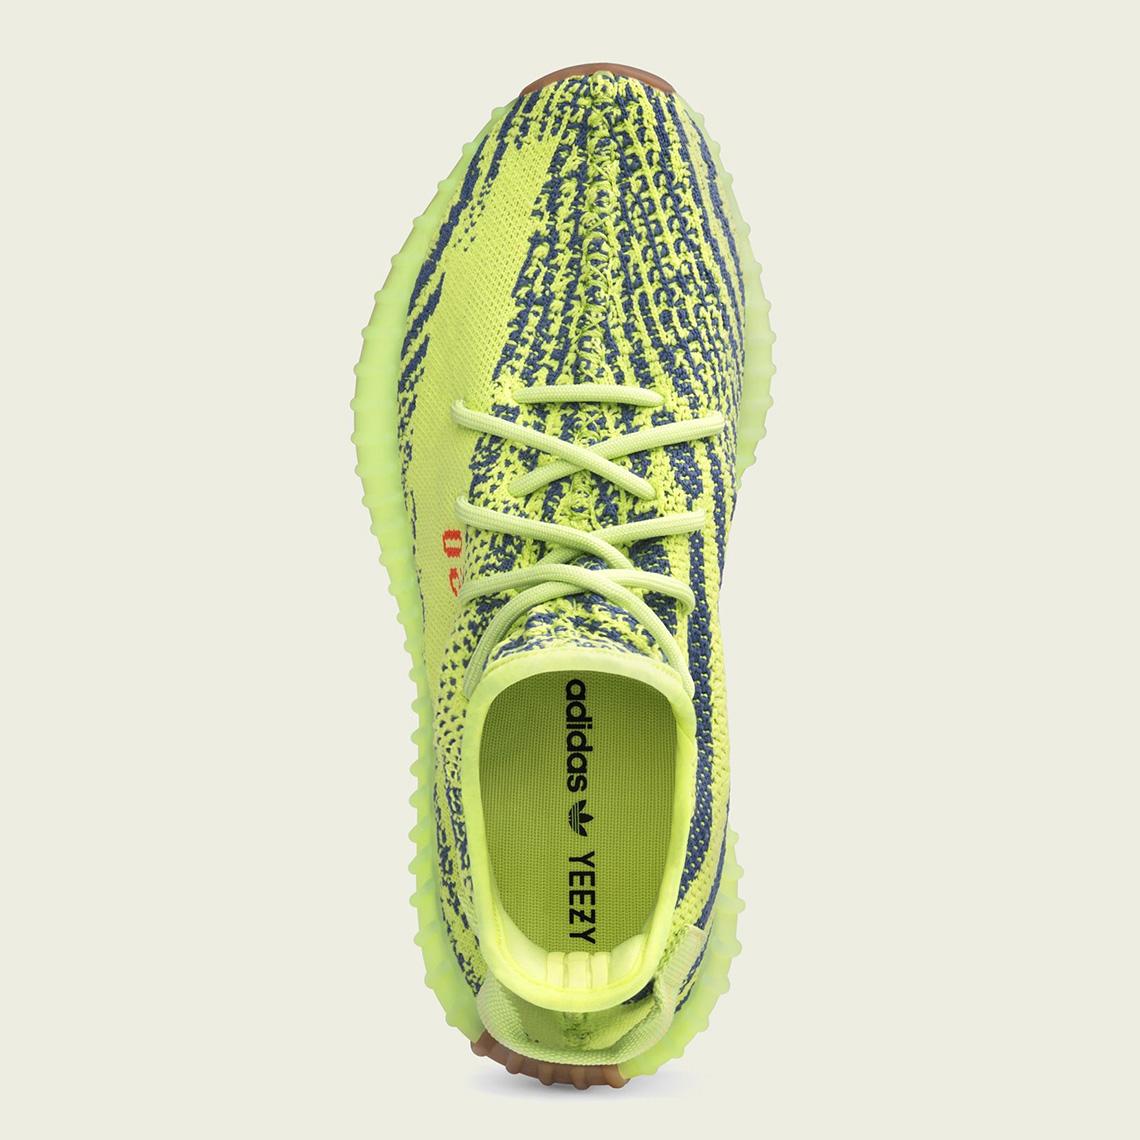 eb06a1a05 adidas Yeezy Boost 350 v2 Semi Frozen Yellow B37572